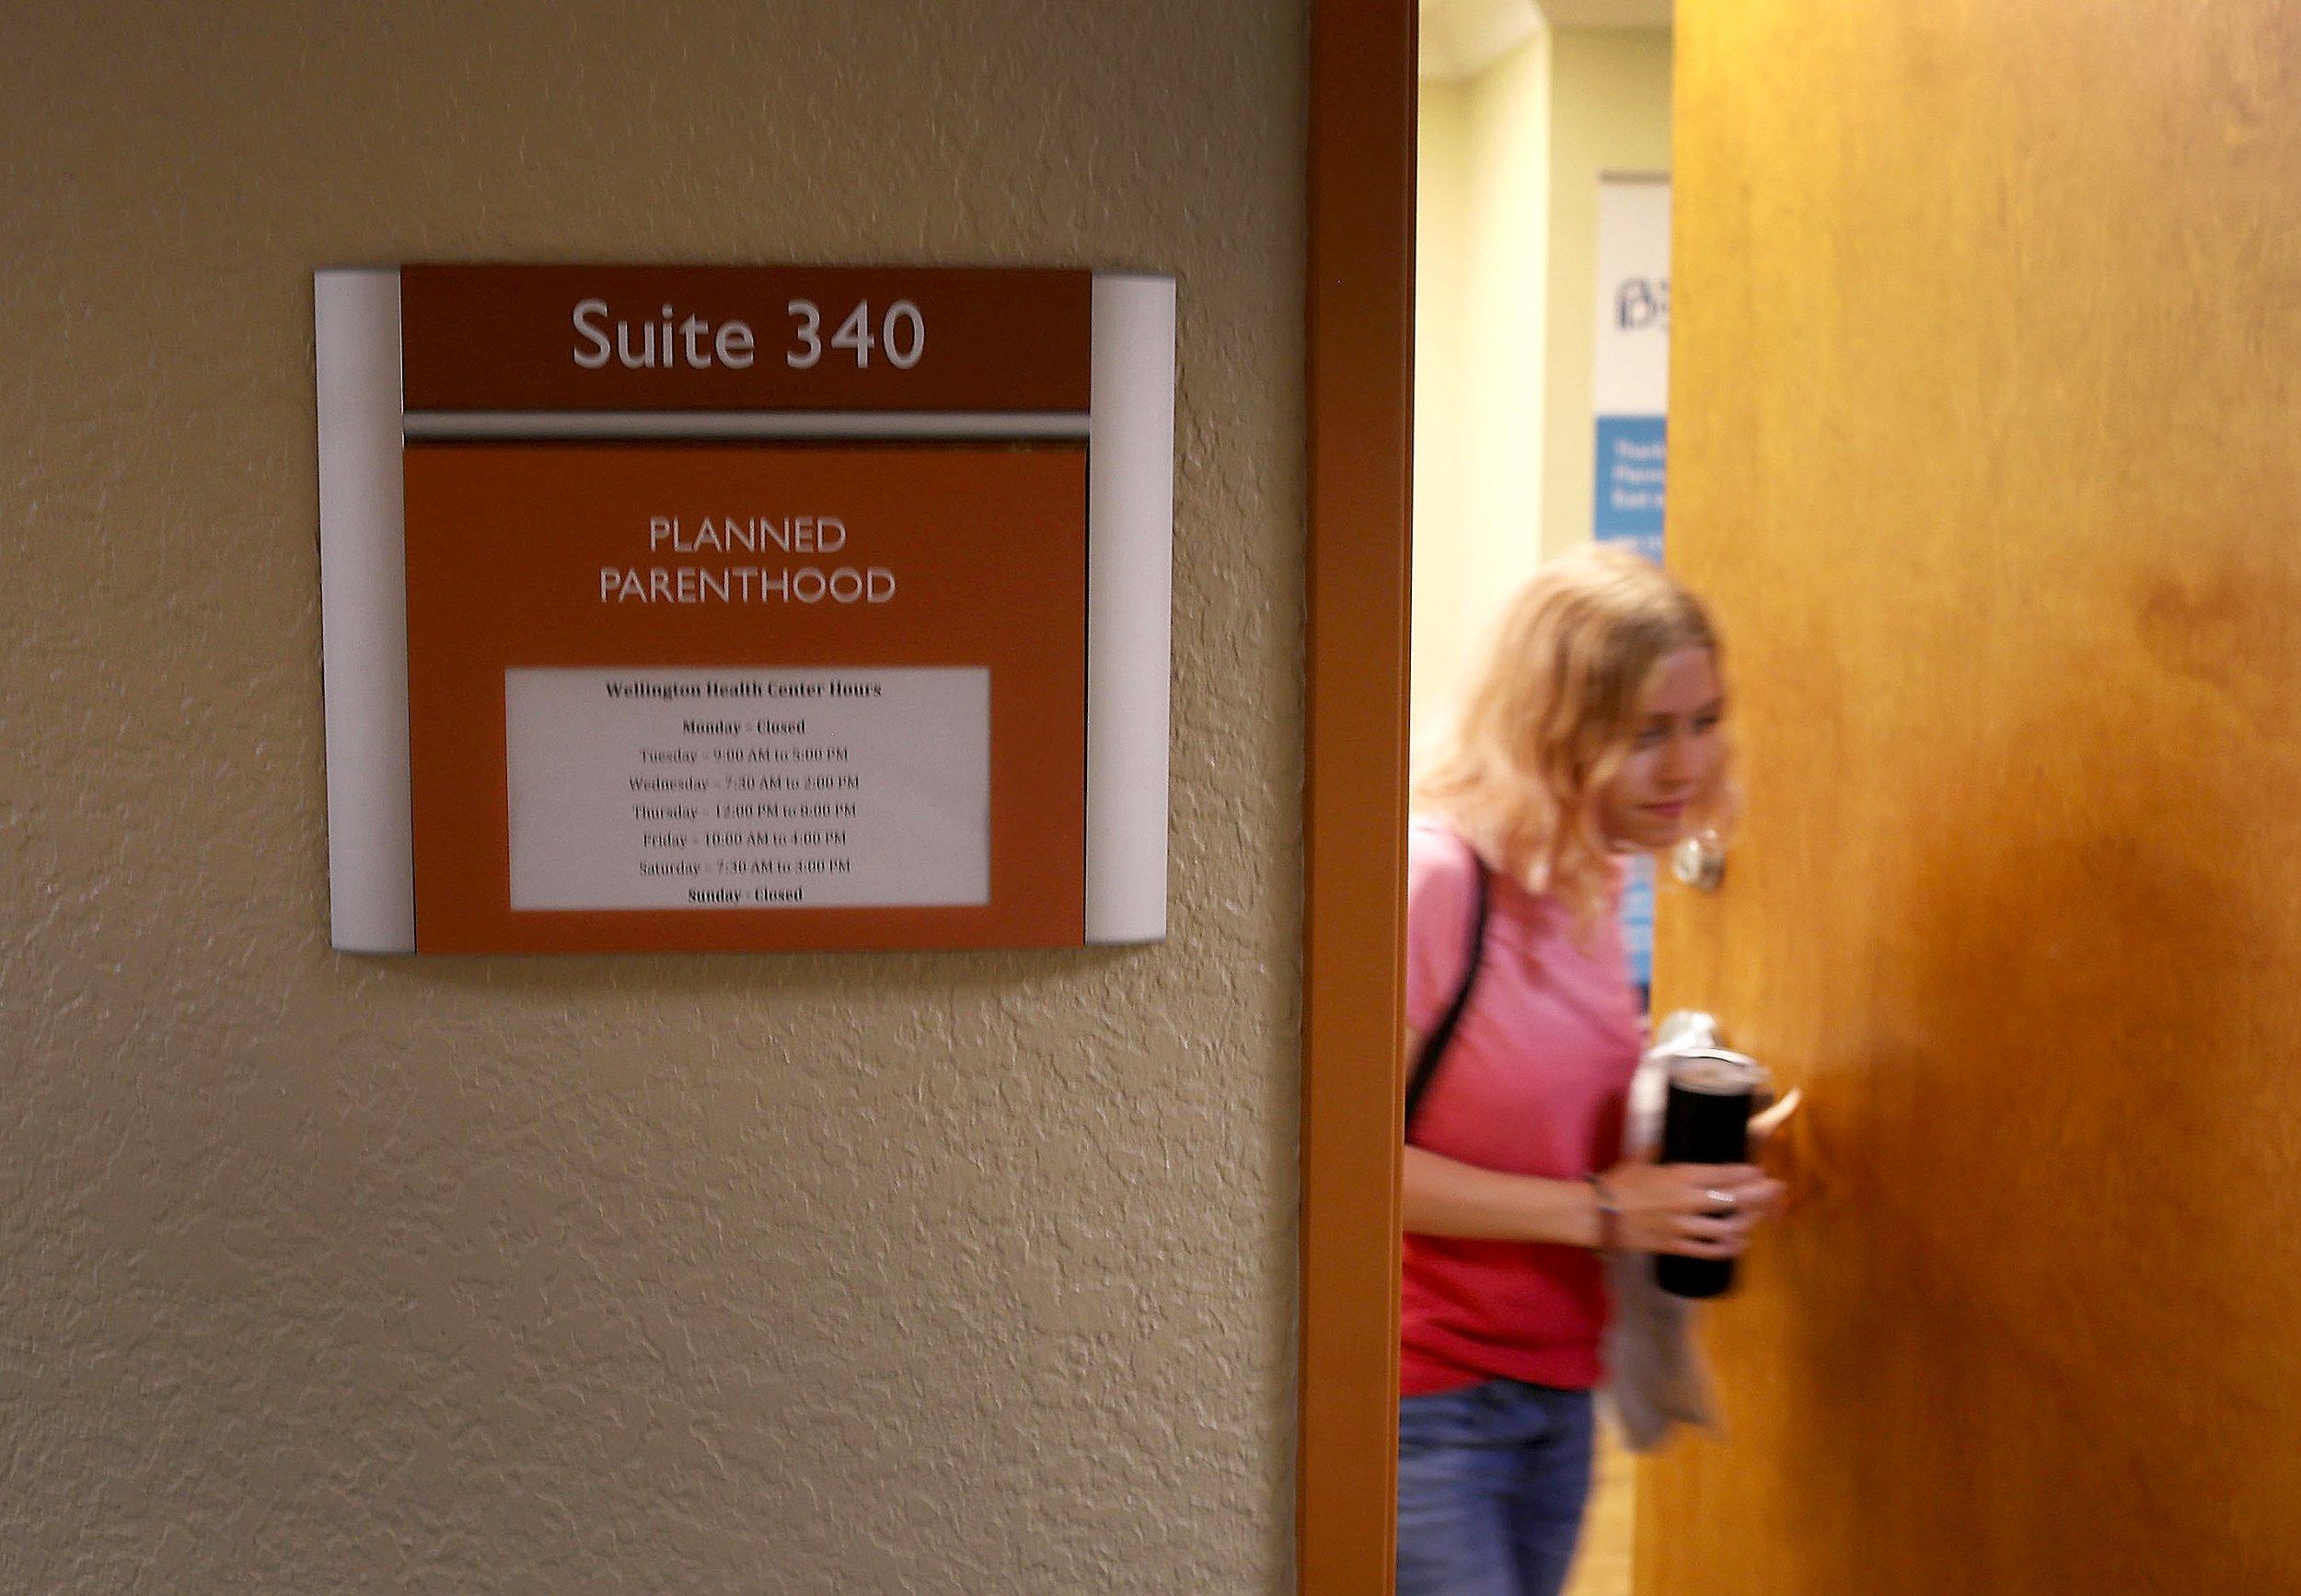 florida abortion law judge ruling parental consent